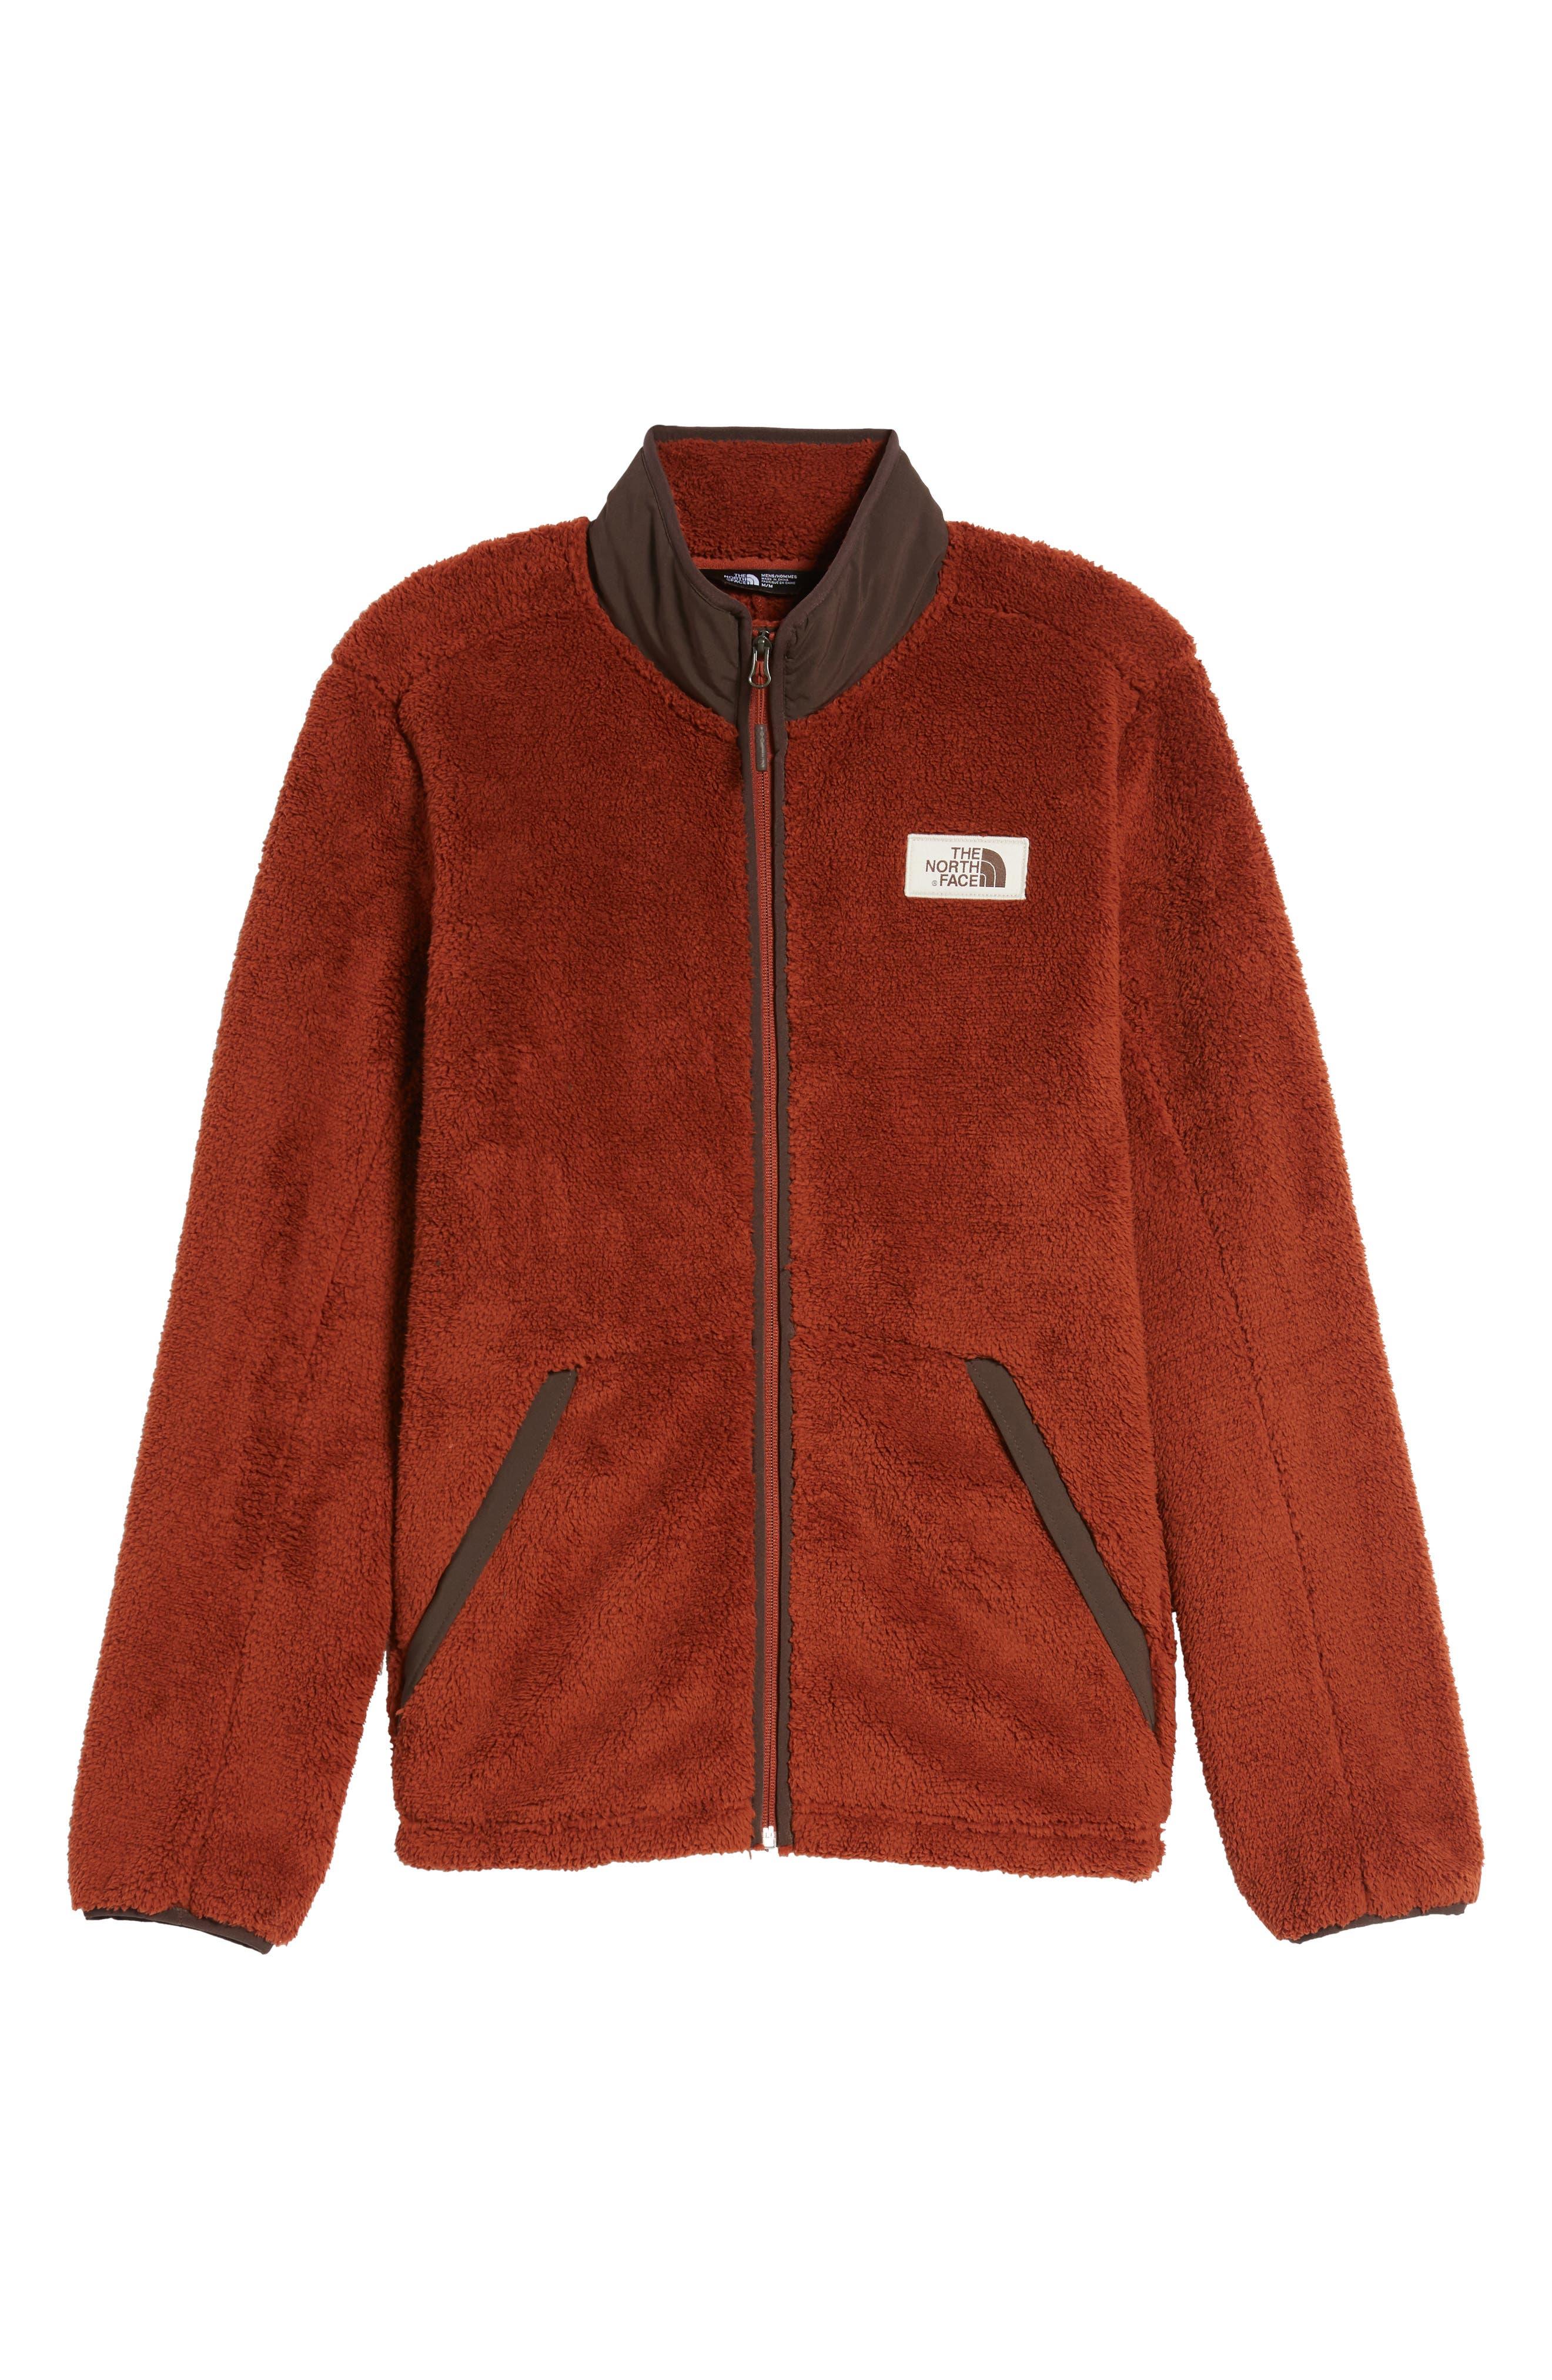 Campshire Zip Fleece Jacket,                             Alternate thumbnail 56, color,